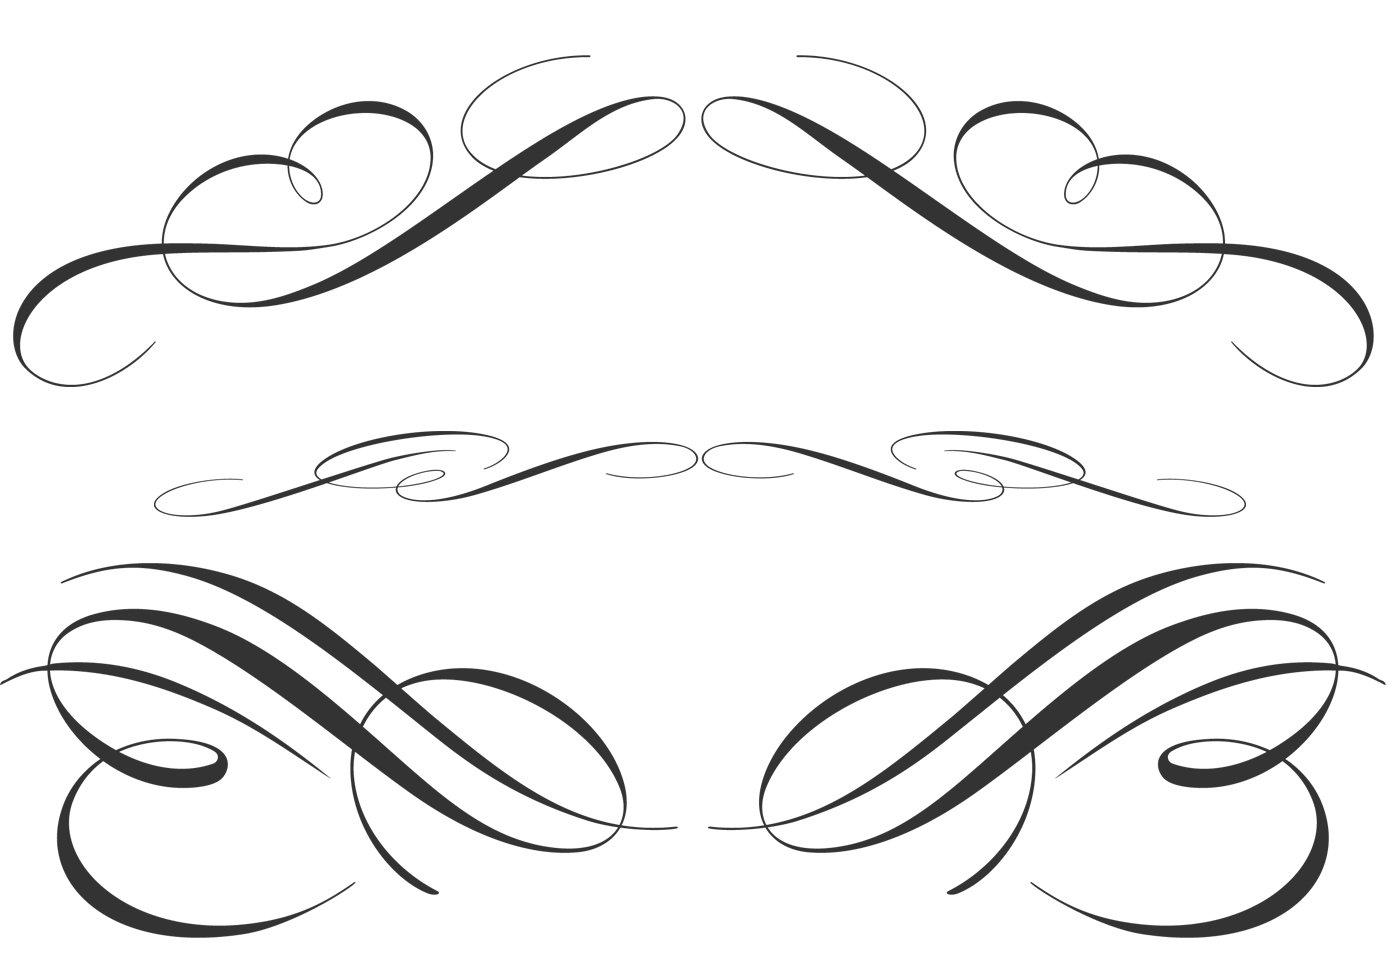 Free Calligraphic Ornament Brushes